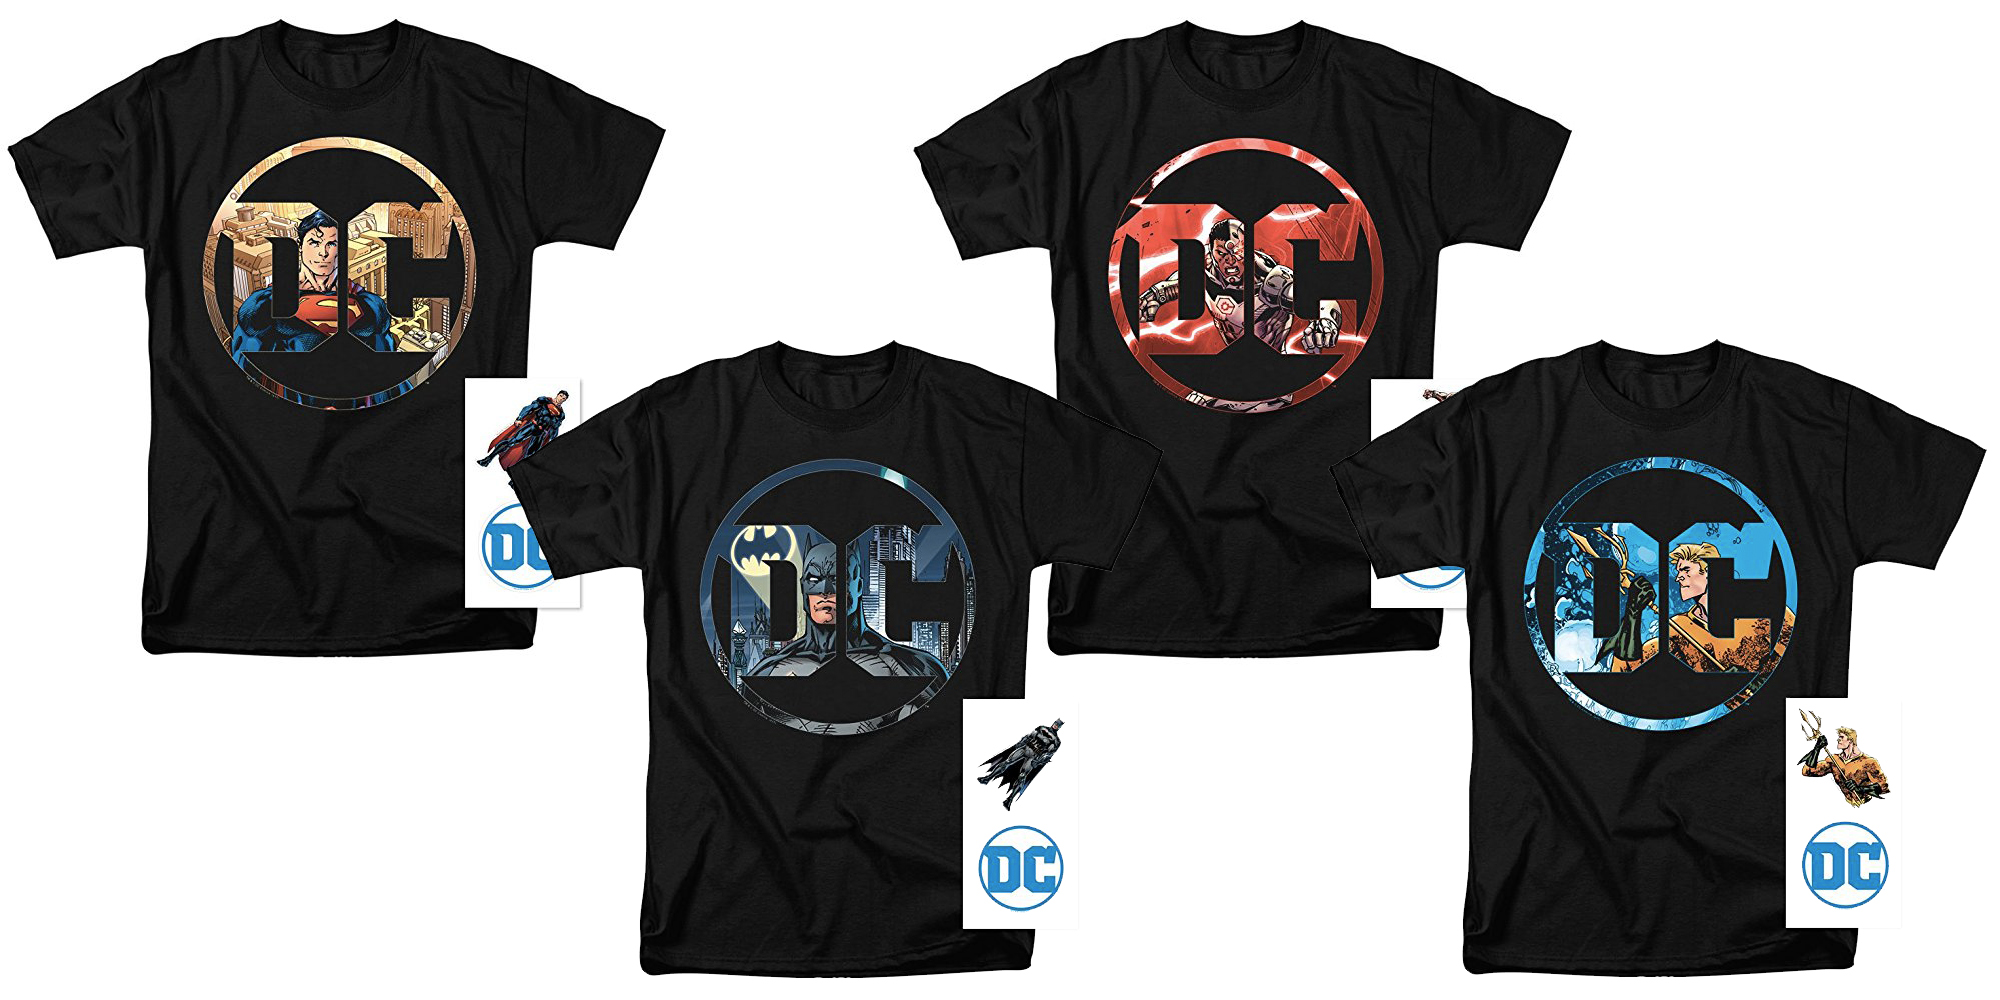 Amazon's Gold Box has $15 DC Comics t-shirts including Batman, Superman, more